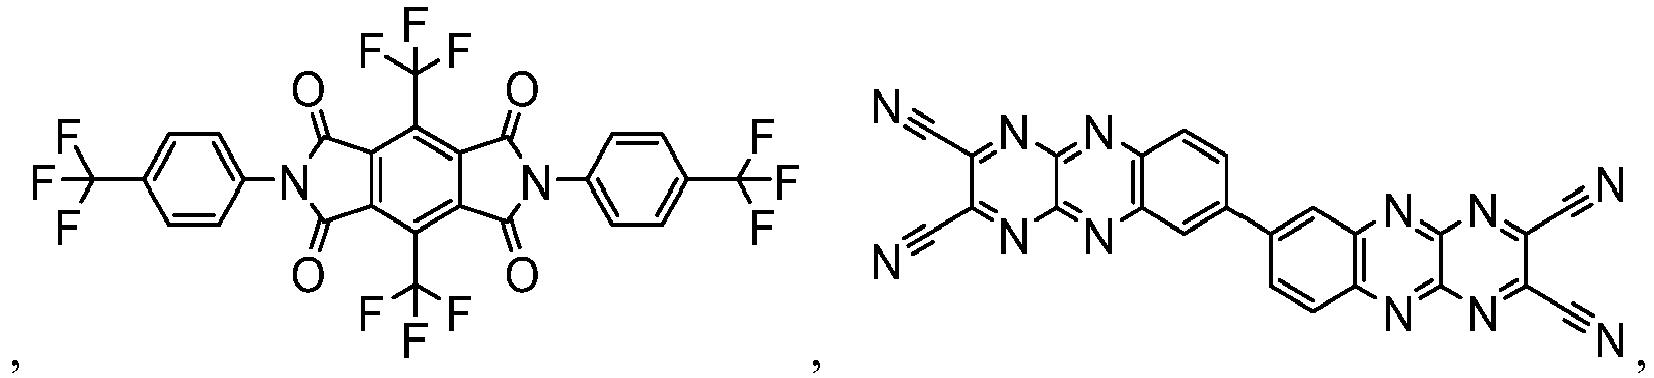 Figure imgb0834